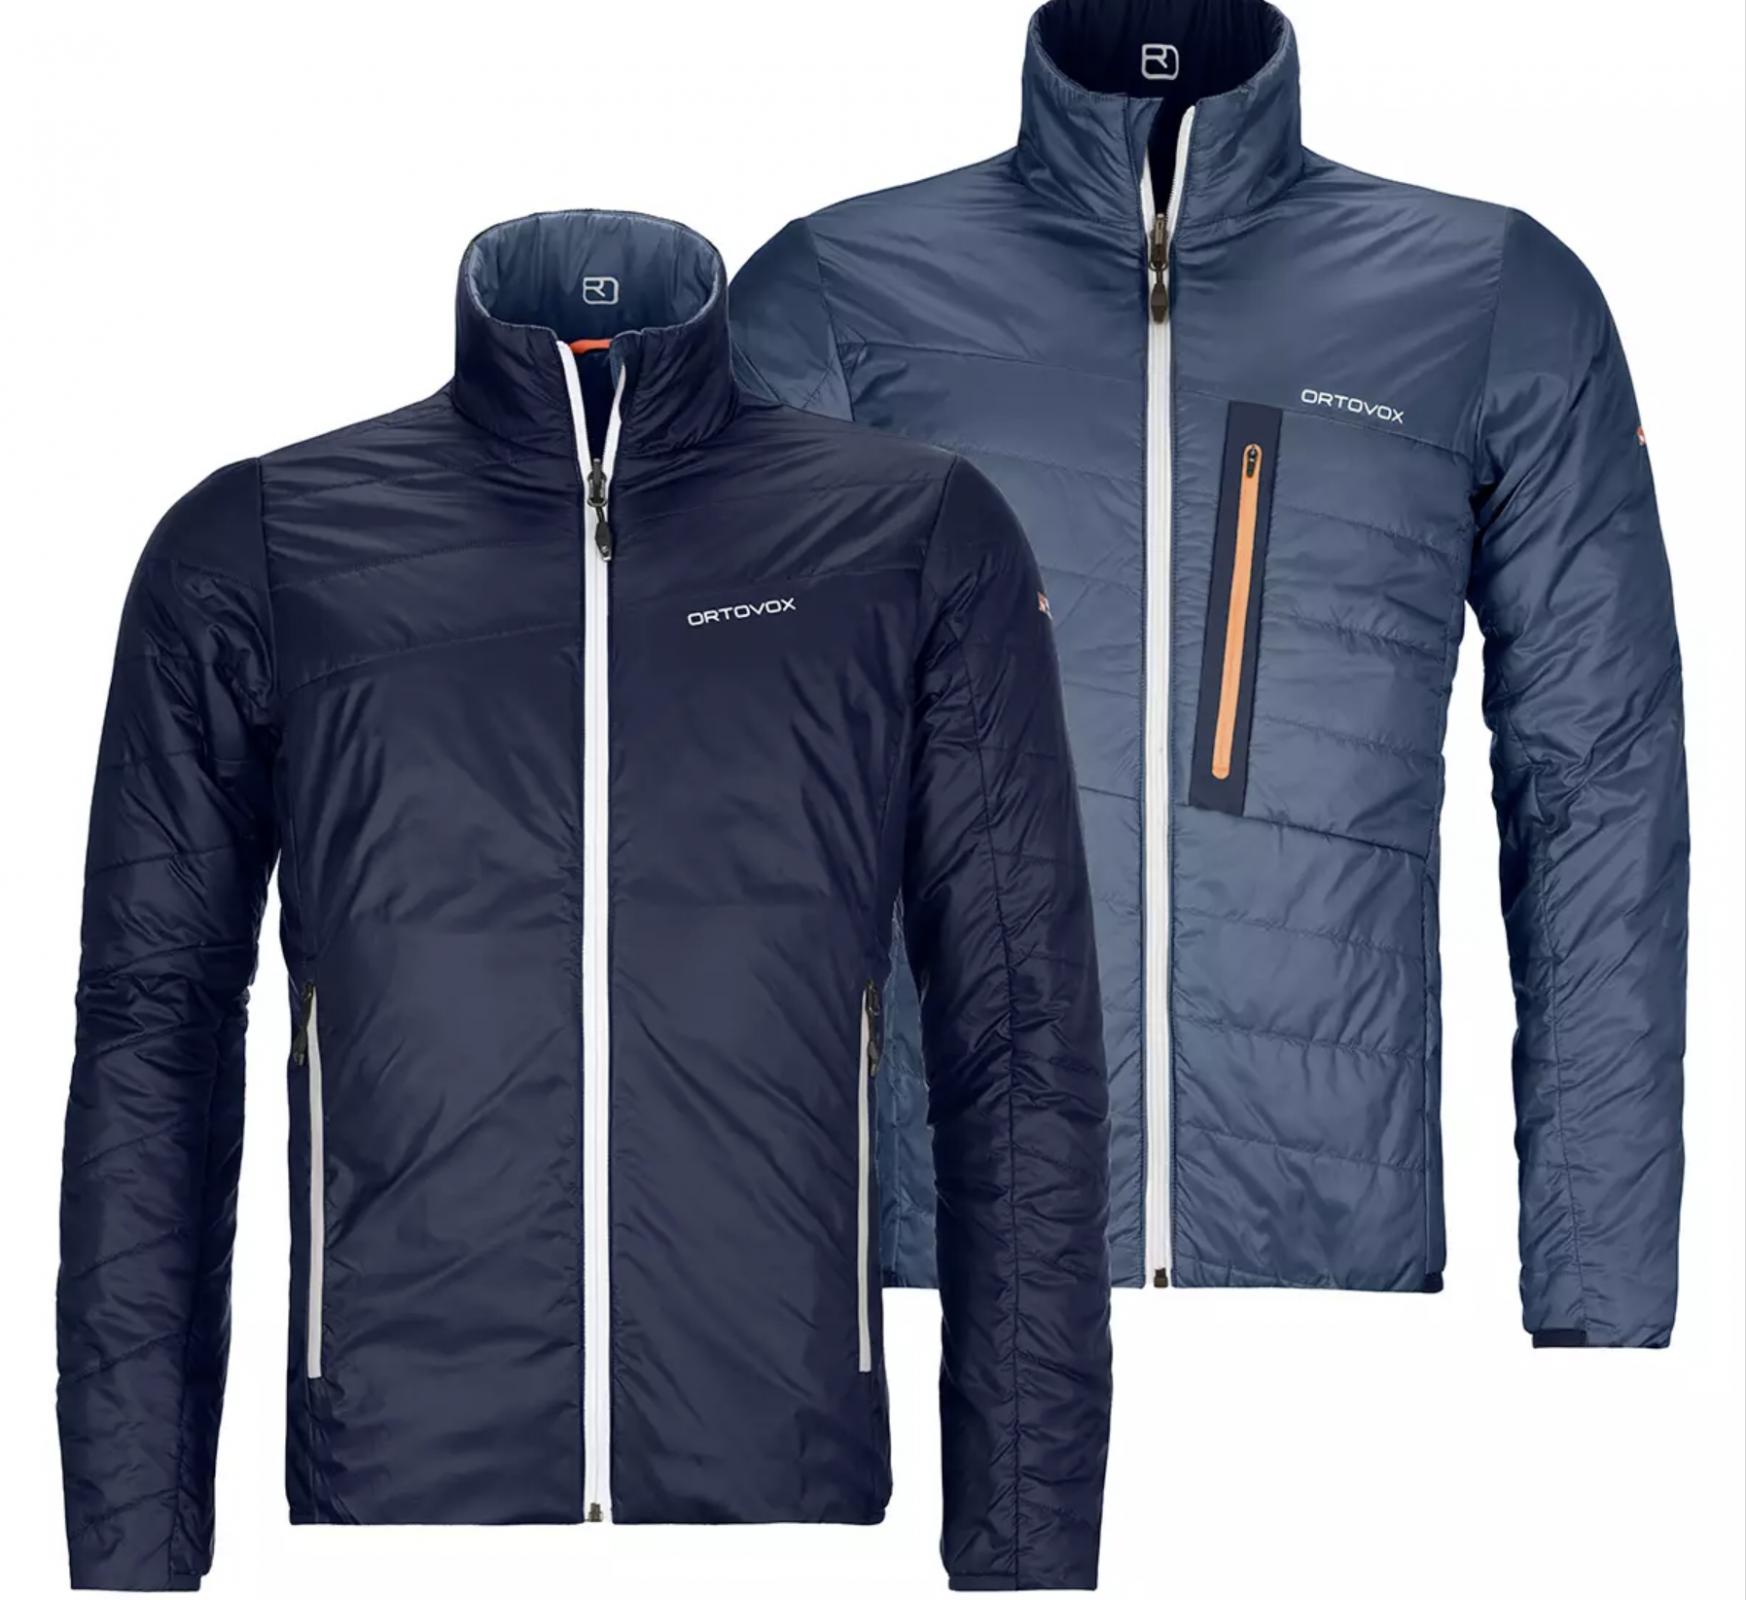 Ortovox Swisswool Piz Boval Men's Jacket